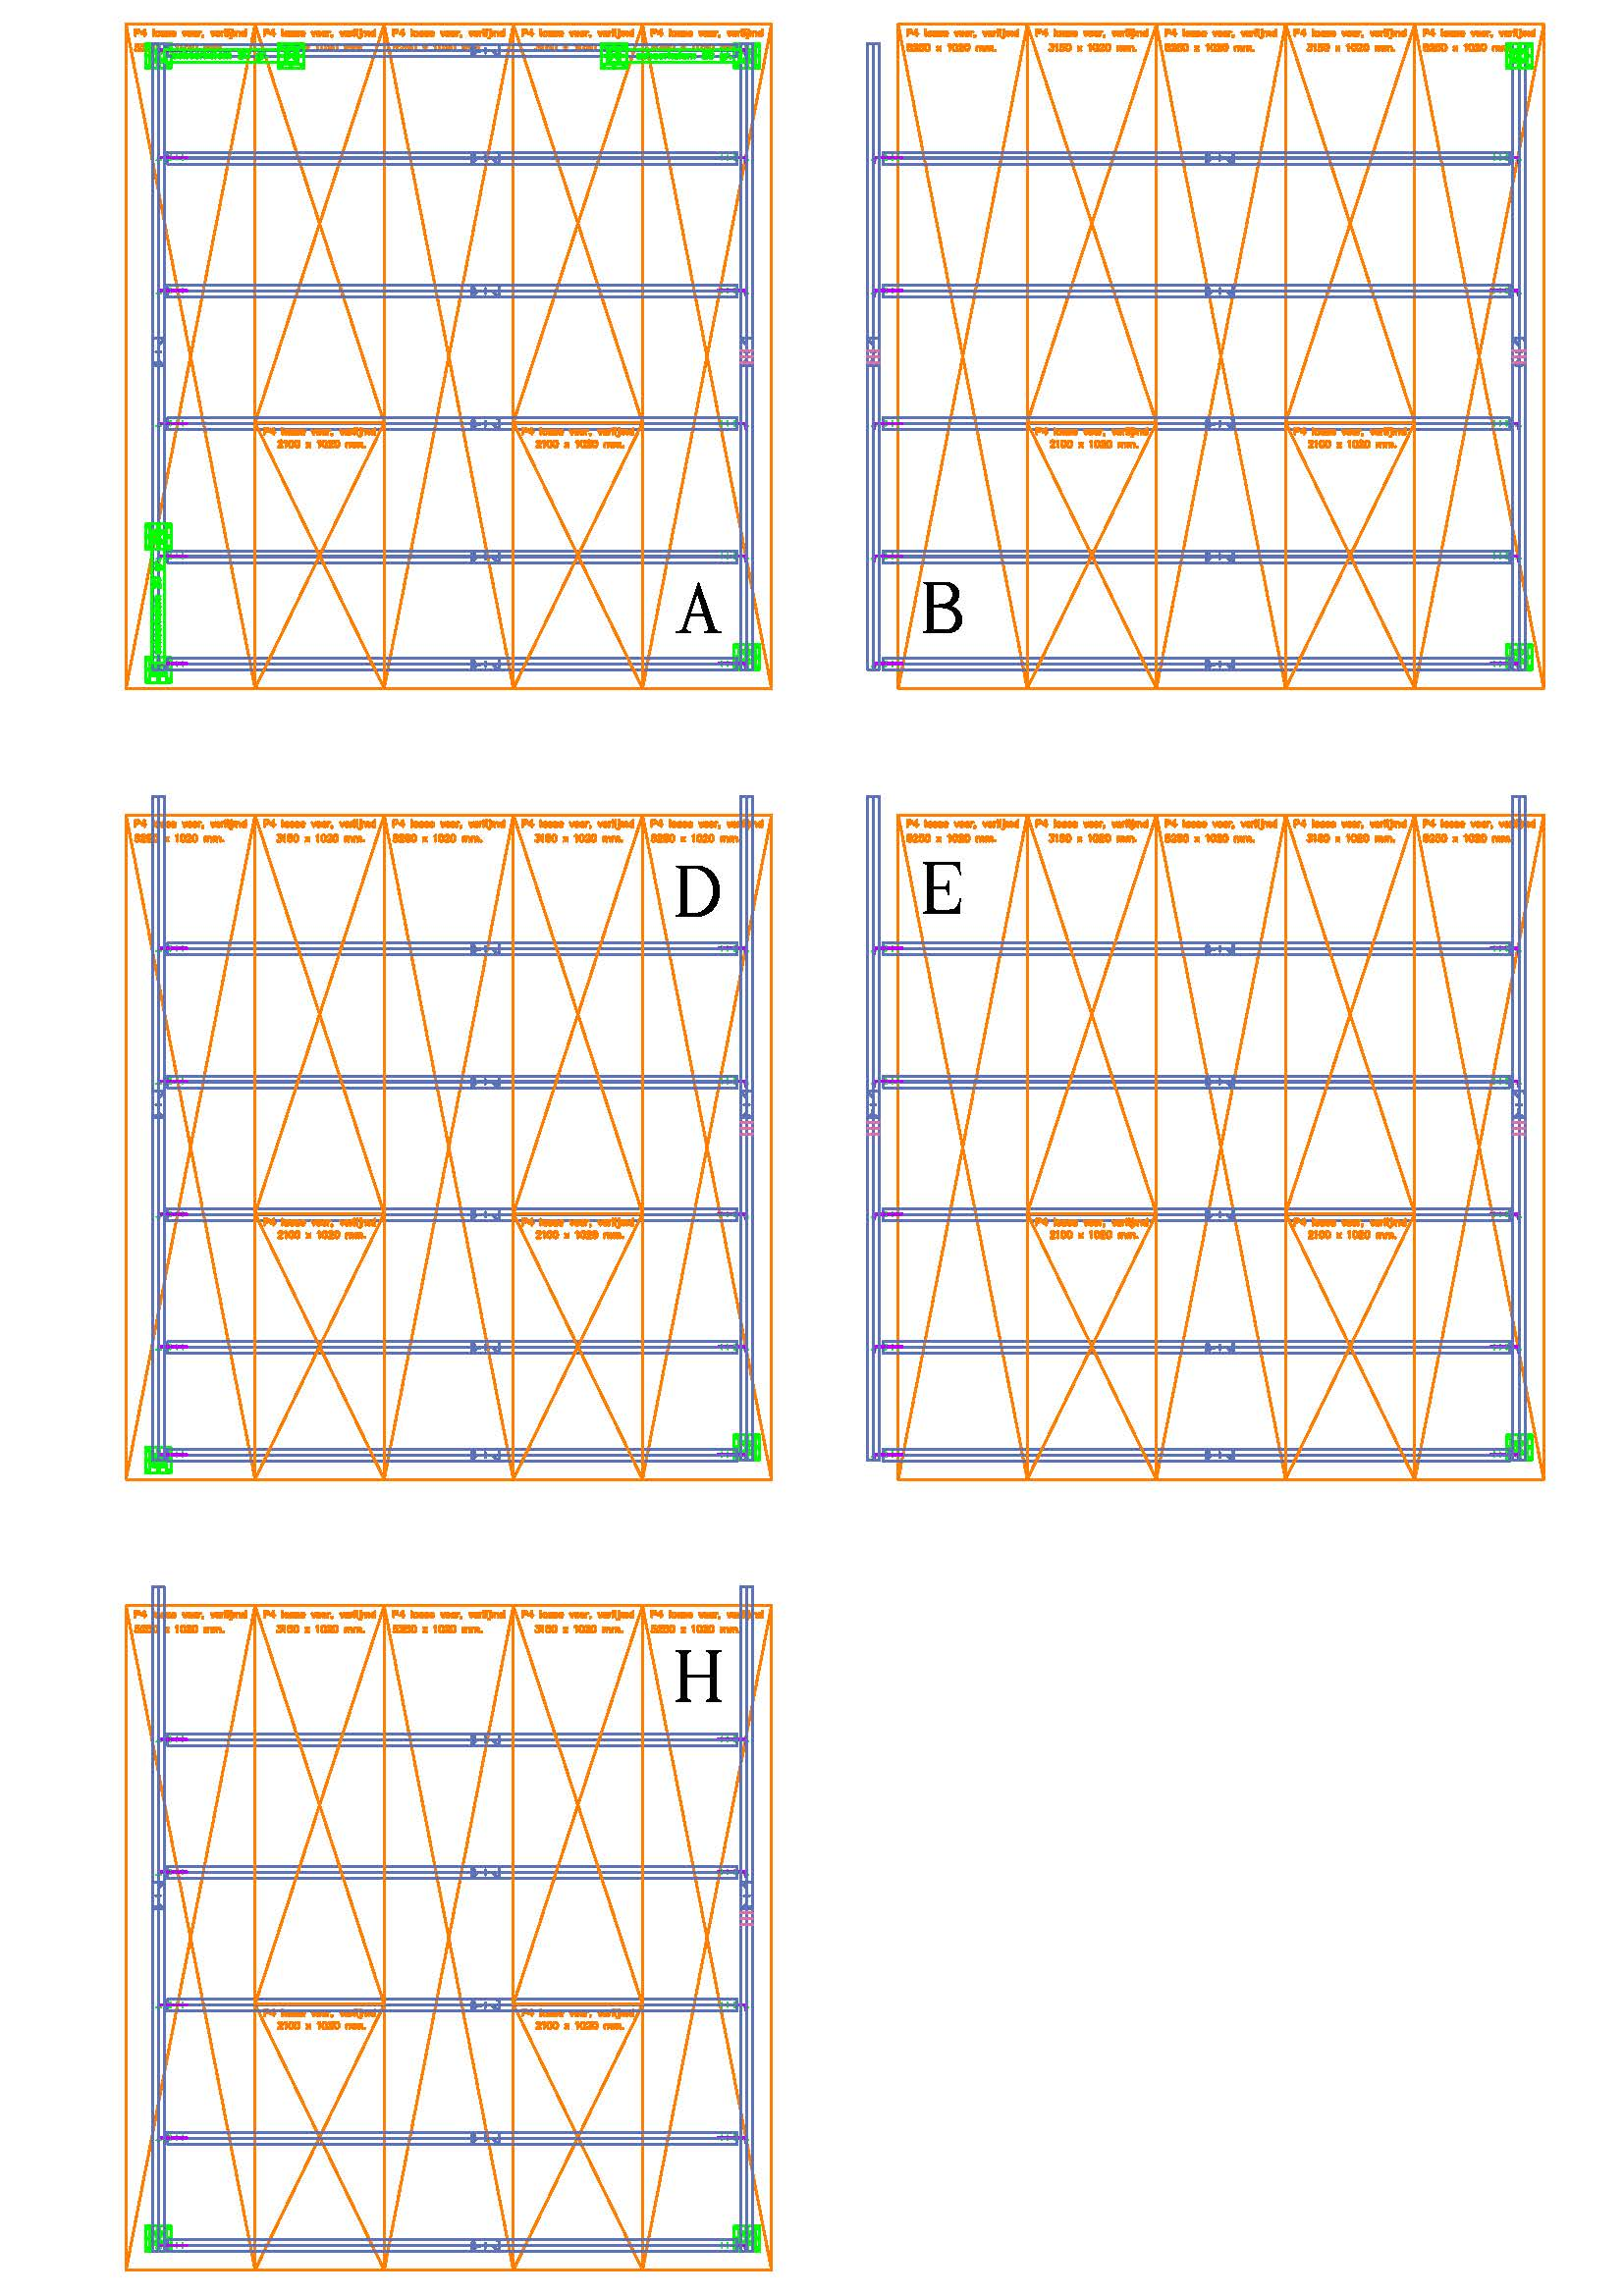 Rechthoekig-platform-mezzanine-tussenvloer-etagevloer-bordes